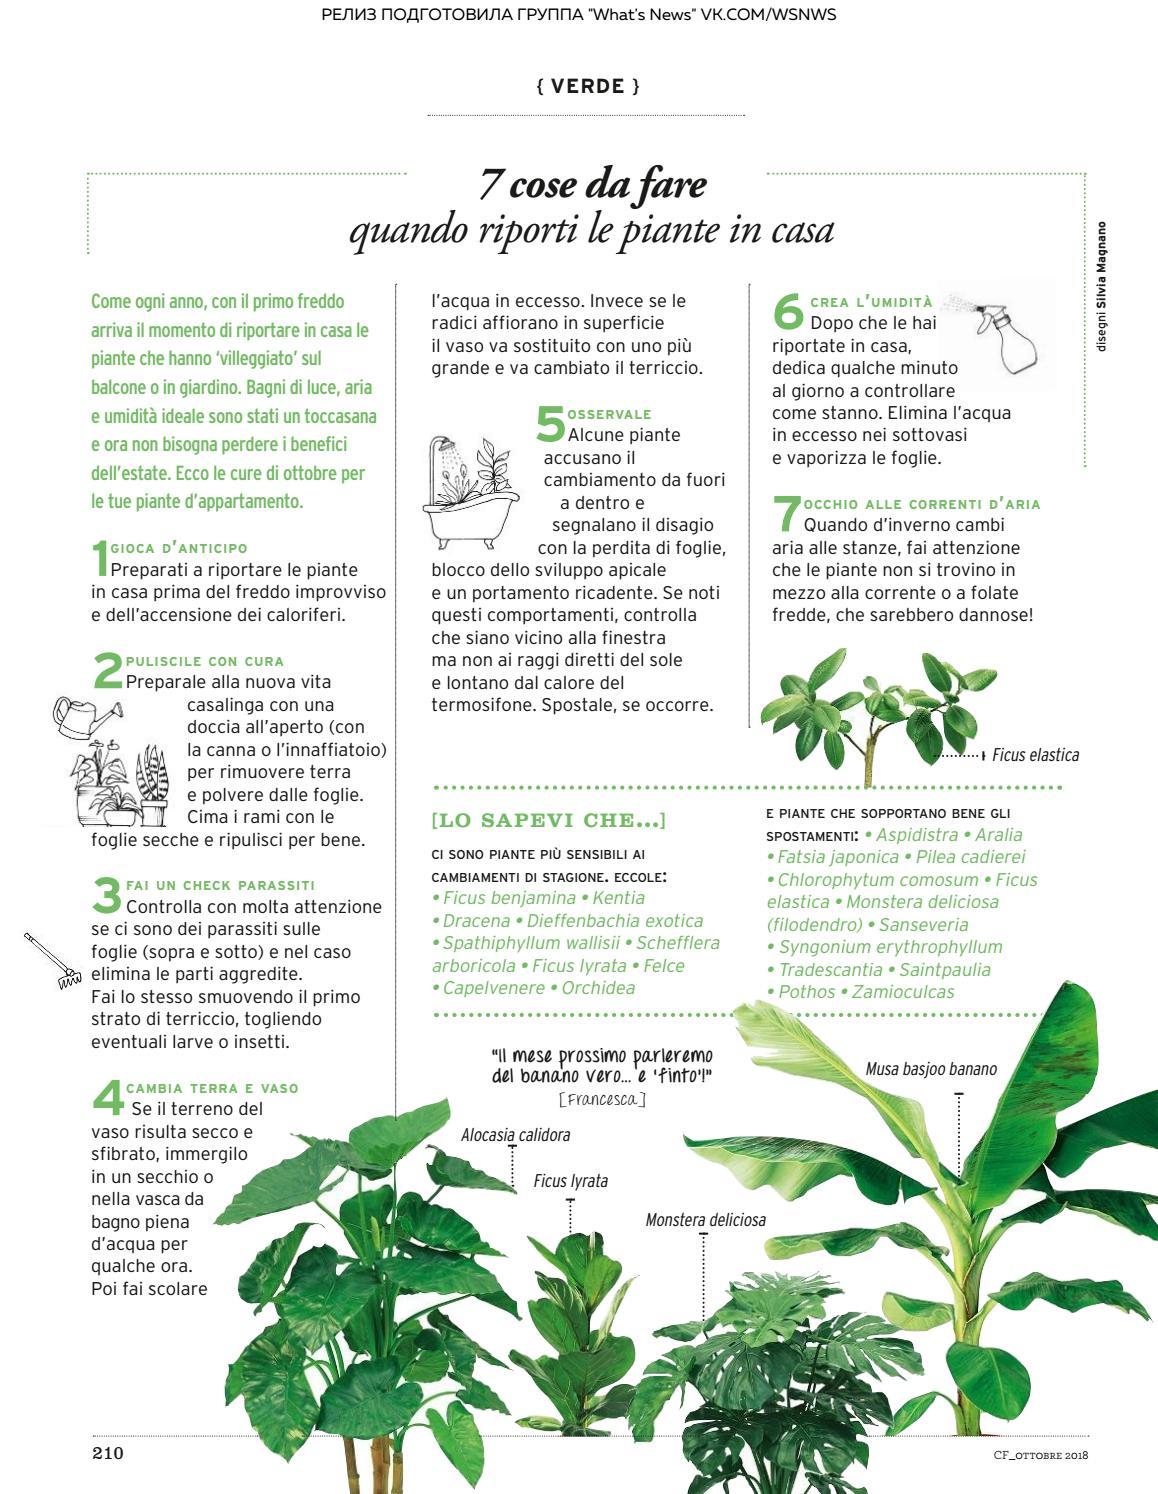 Ficus Benjamin Perde Foglie gahahhhahabha by elloco2019 - issuu